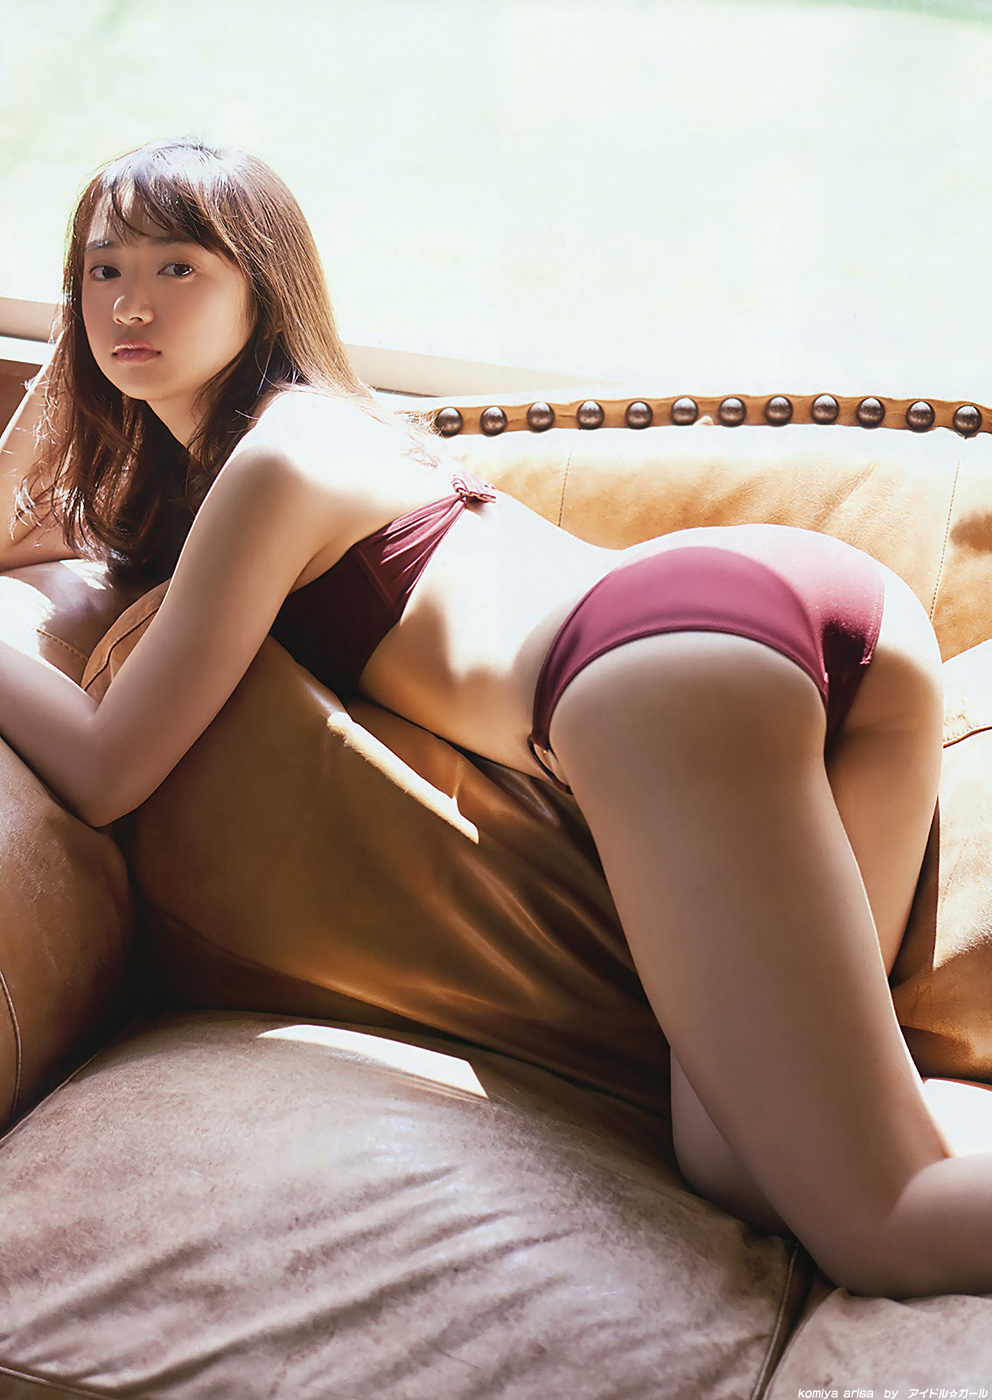 image http://scanlover.com/assets/images/47-3AZU6kZx3g8Tgigc.jpeg